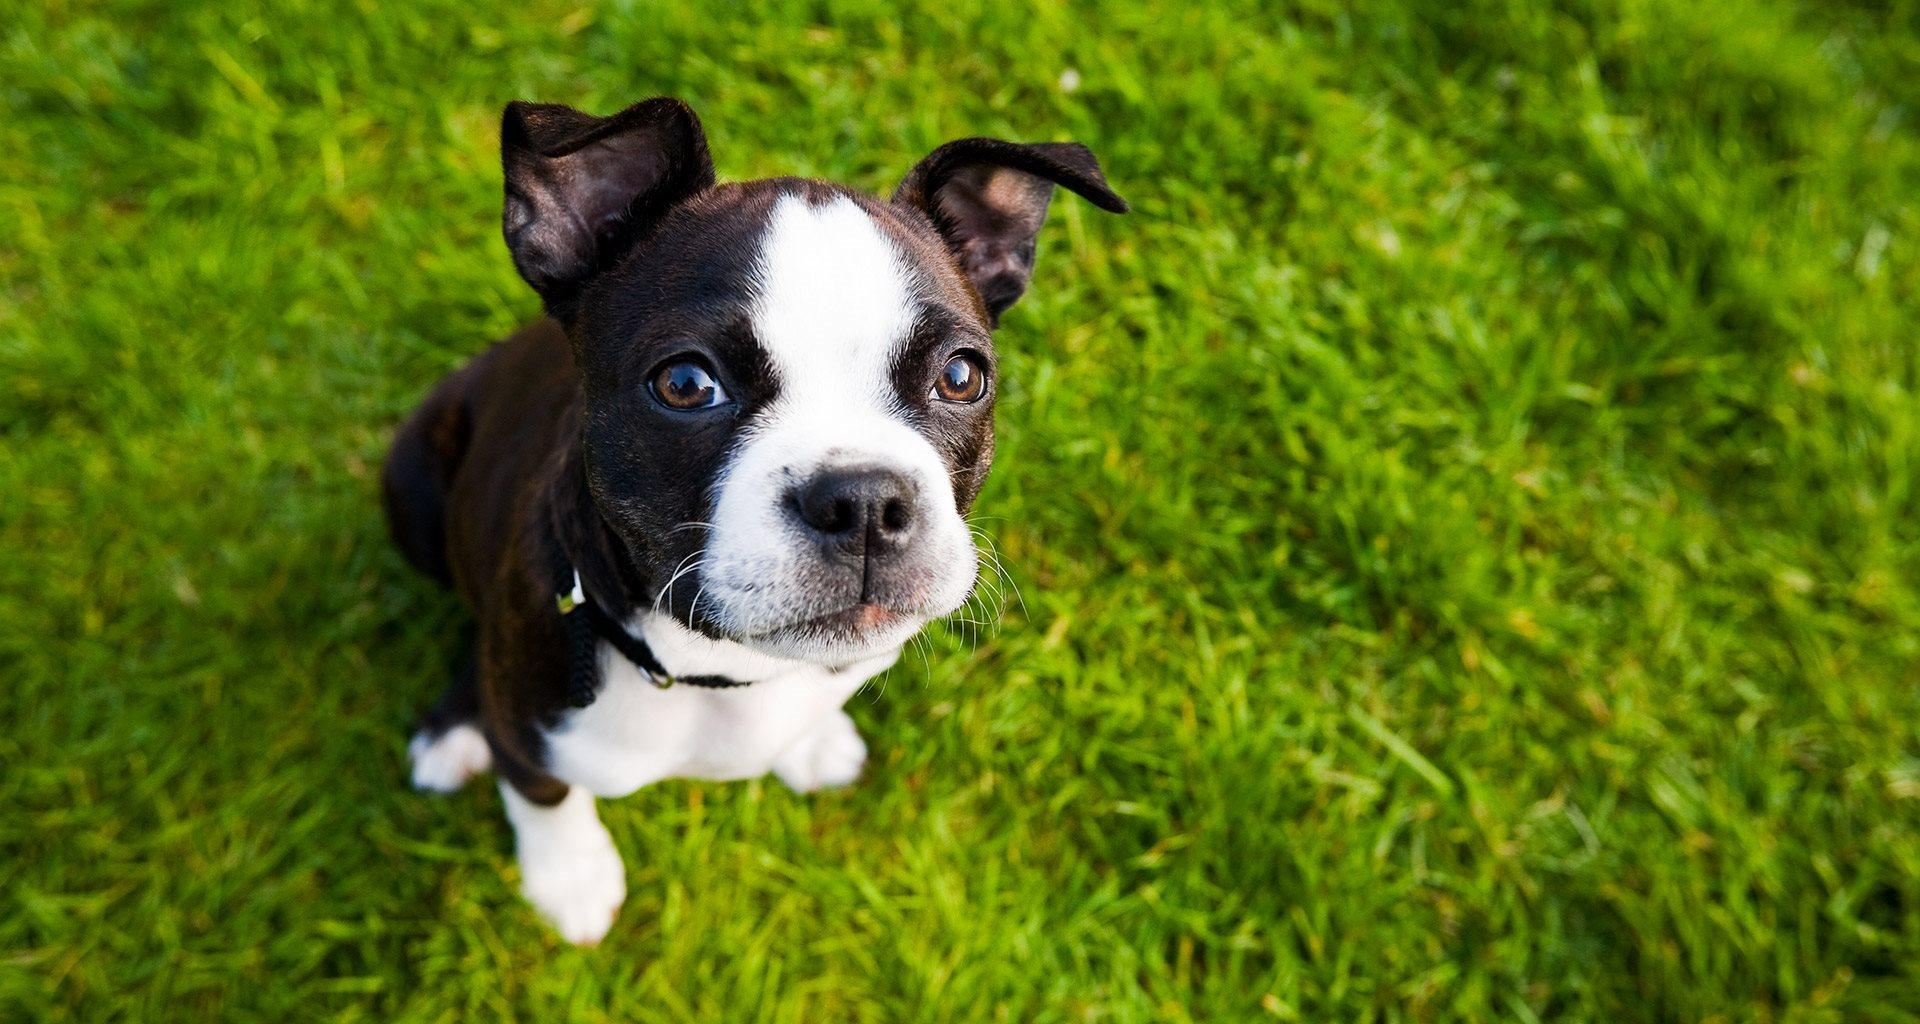 Dog Park available at Aqua Links, Sanford Florida